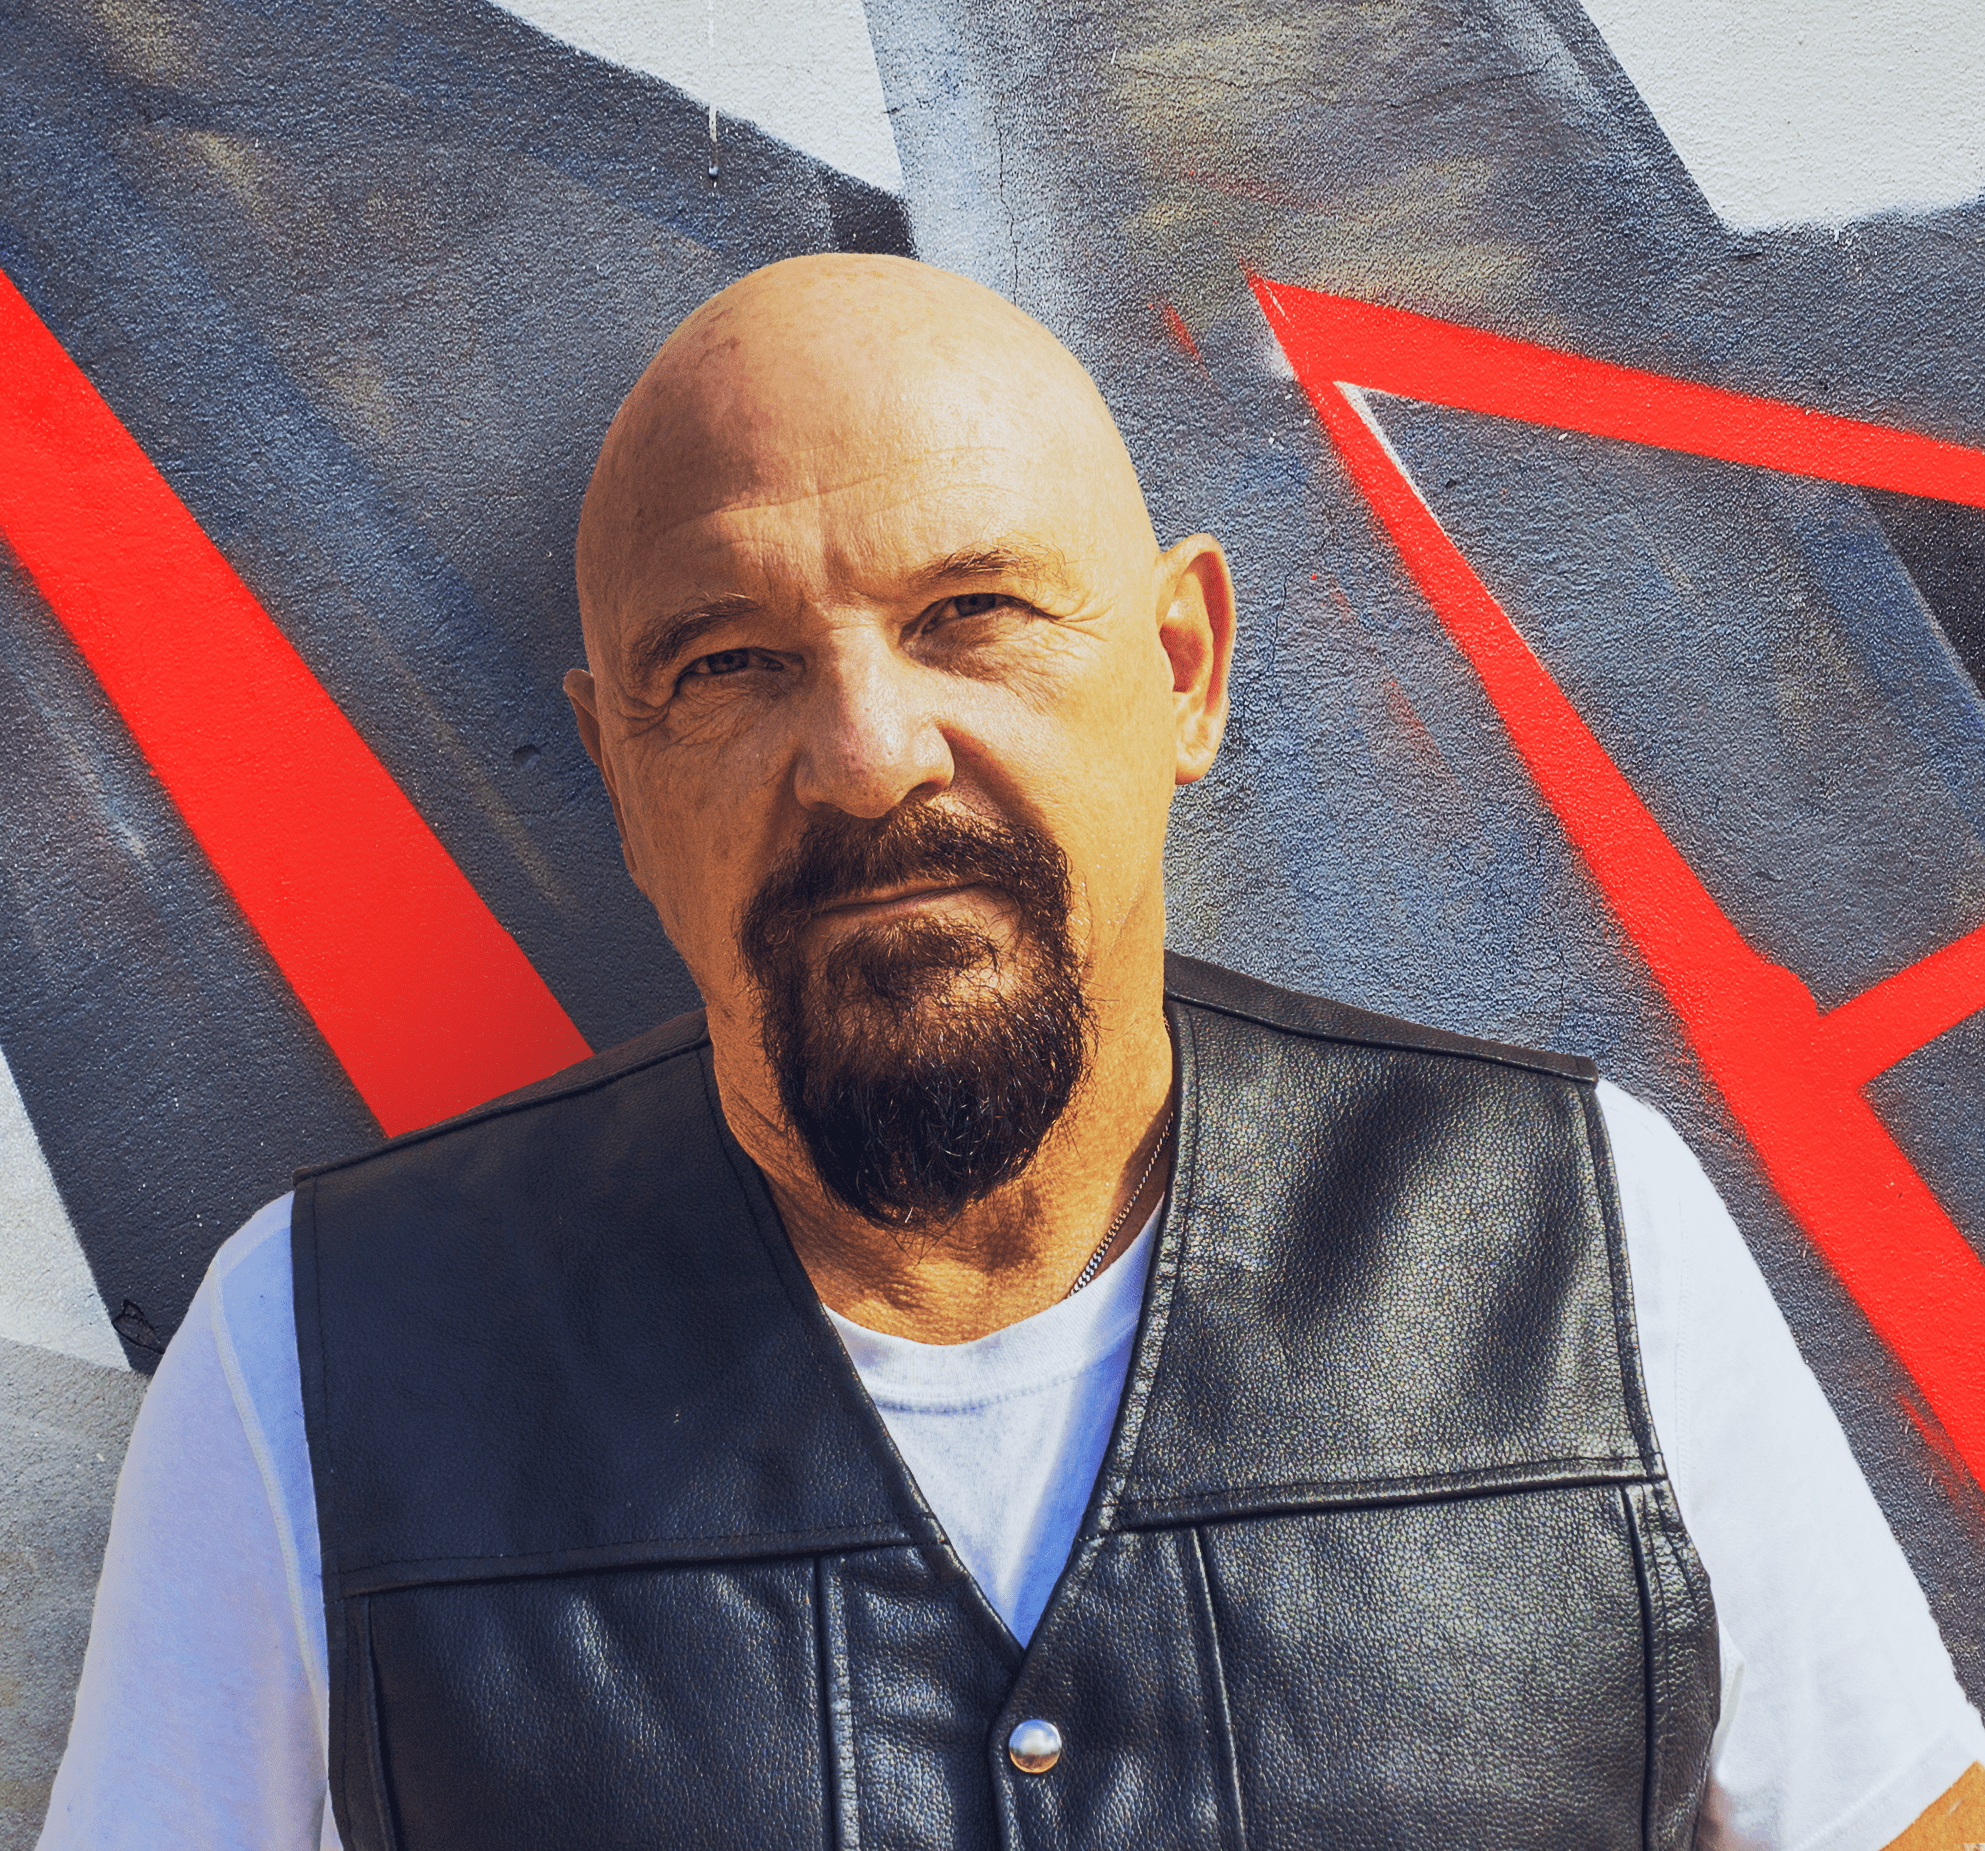 Michael-Woroniecki-2019